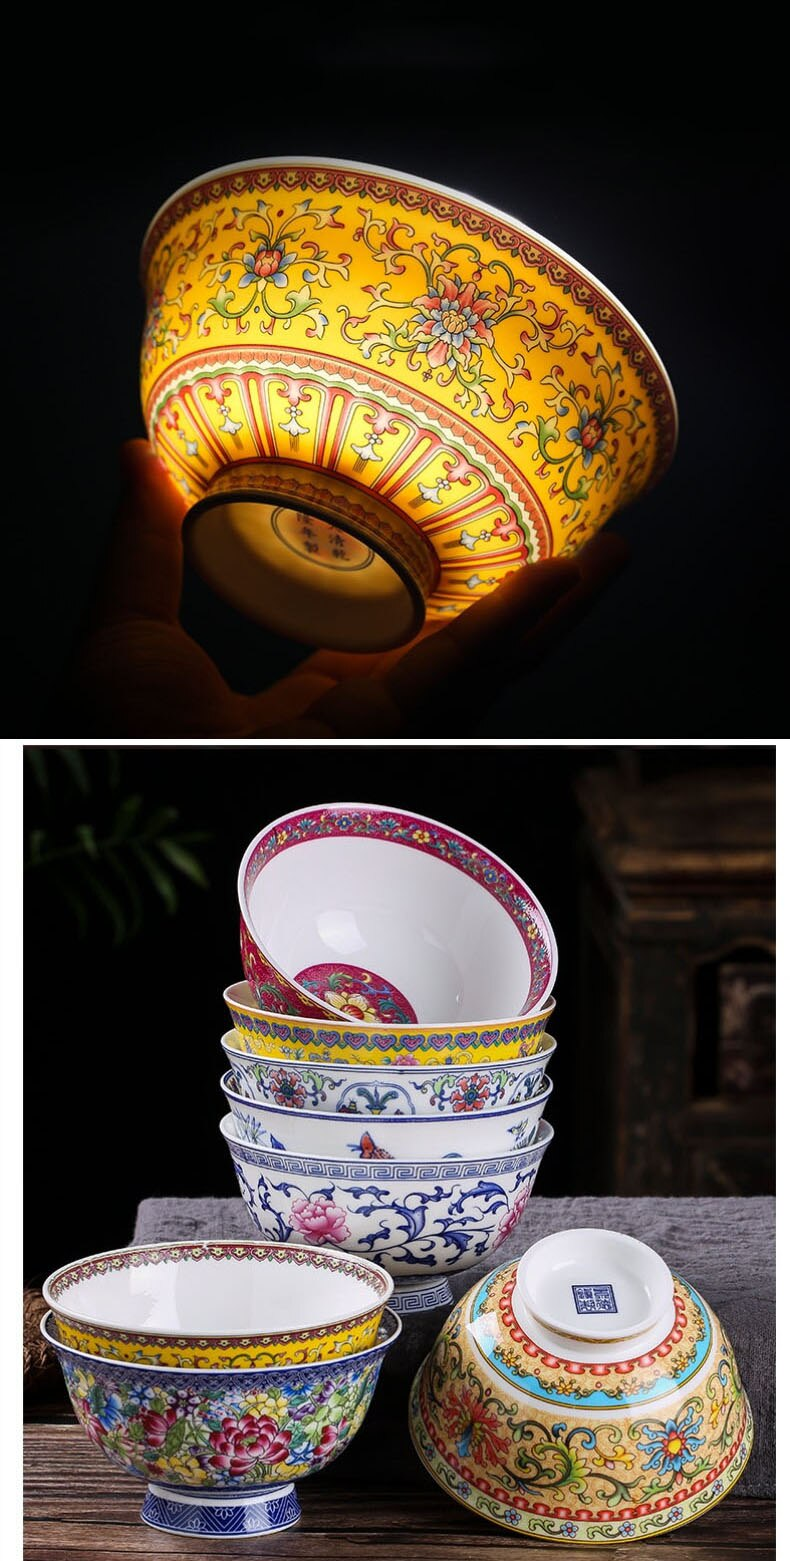 4.5 inch Jingdezhen Ceramic Small Rice Bowl Chinese Bone china Ramen Mixing Bowls Dinnerware Home Kitchen Tableware Food Holder